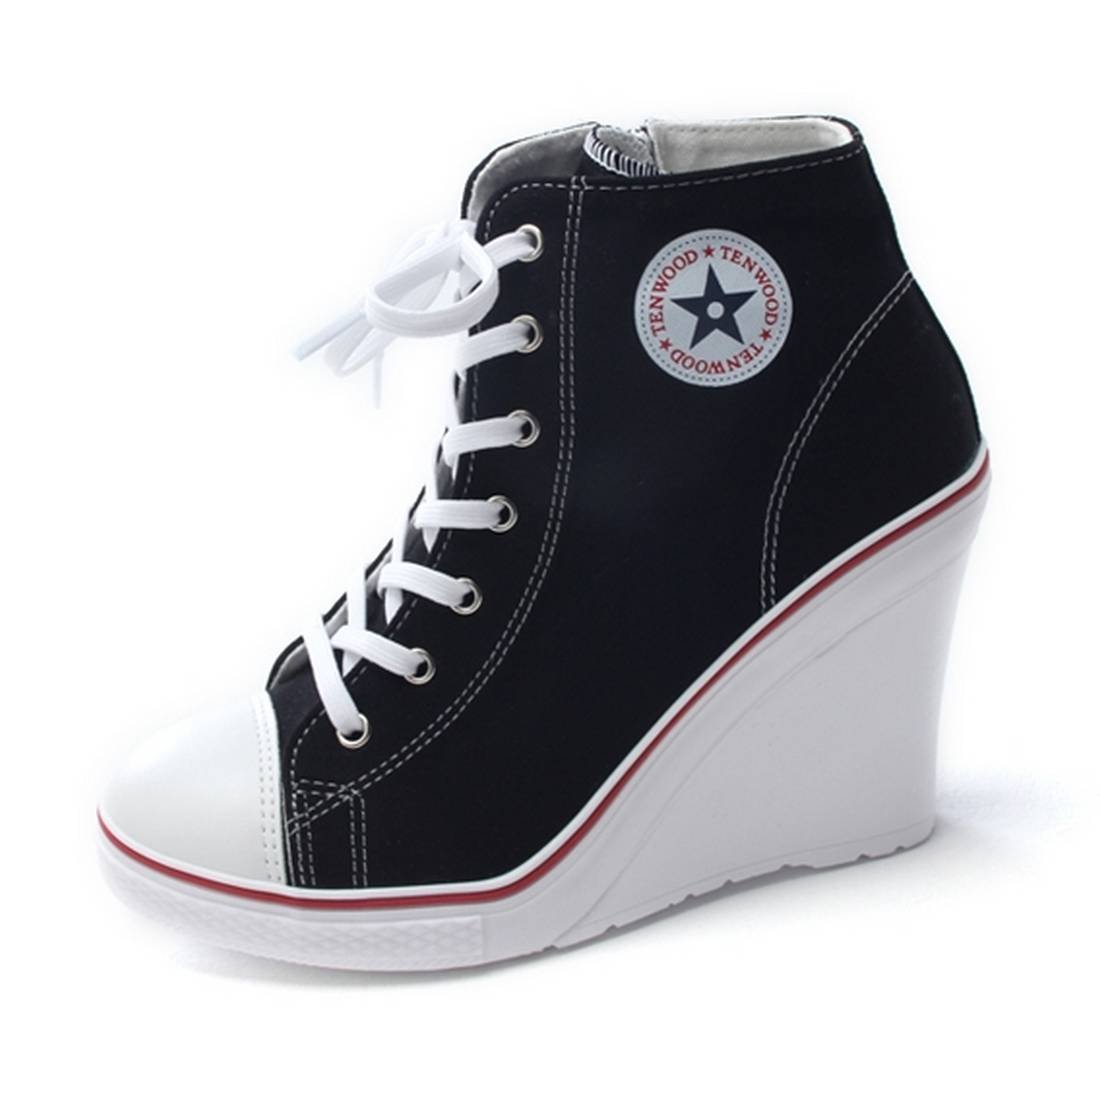 EpicStep Women's Canvas High Top Wedges High Heels Casual Fashion Sneakers B00XTVJM74 7.5 B(M) US|Black